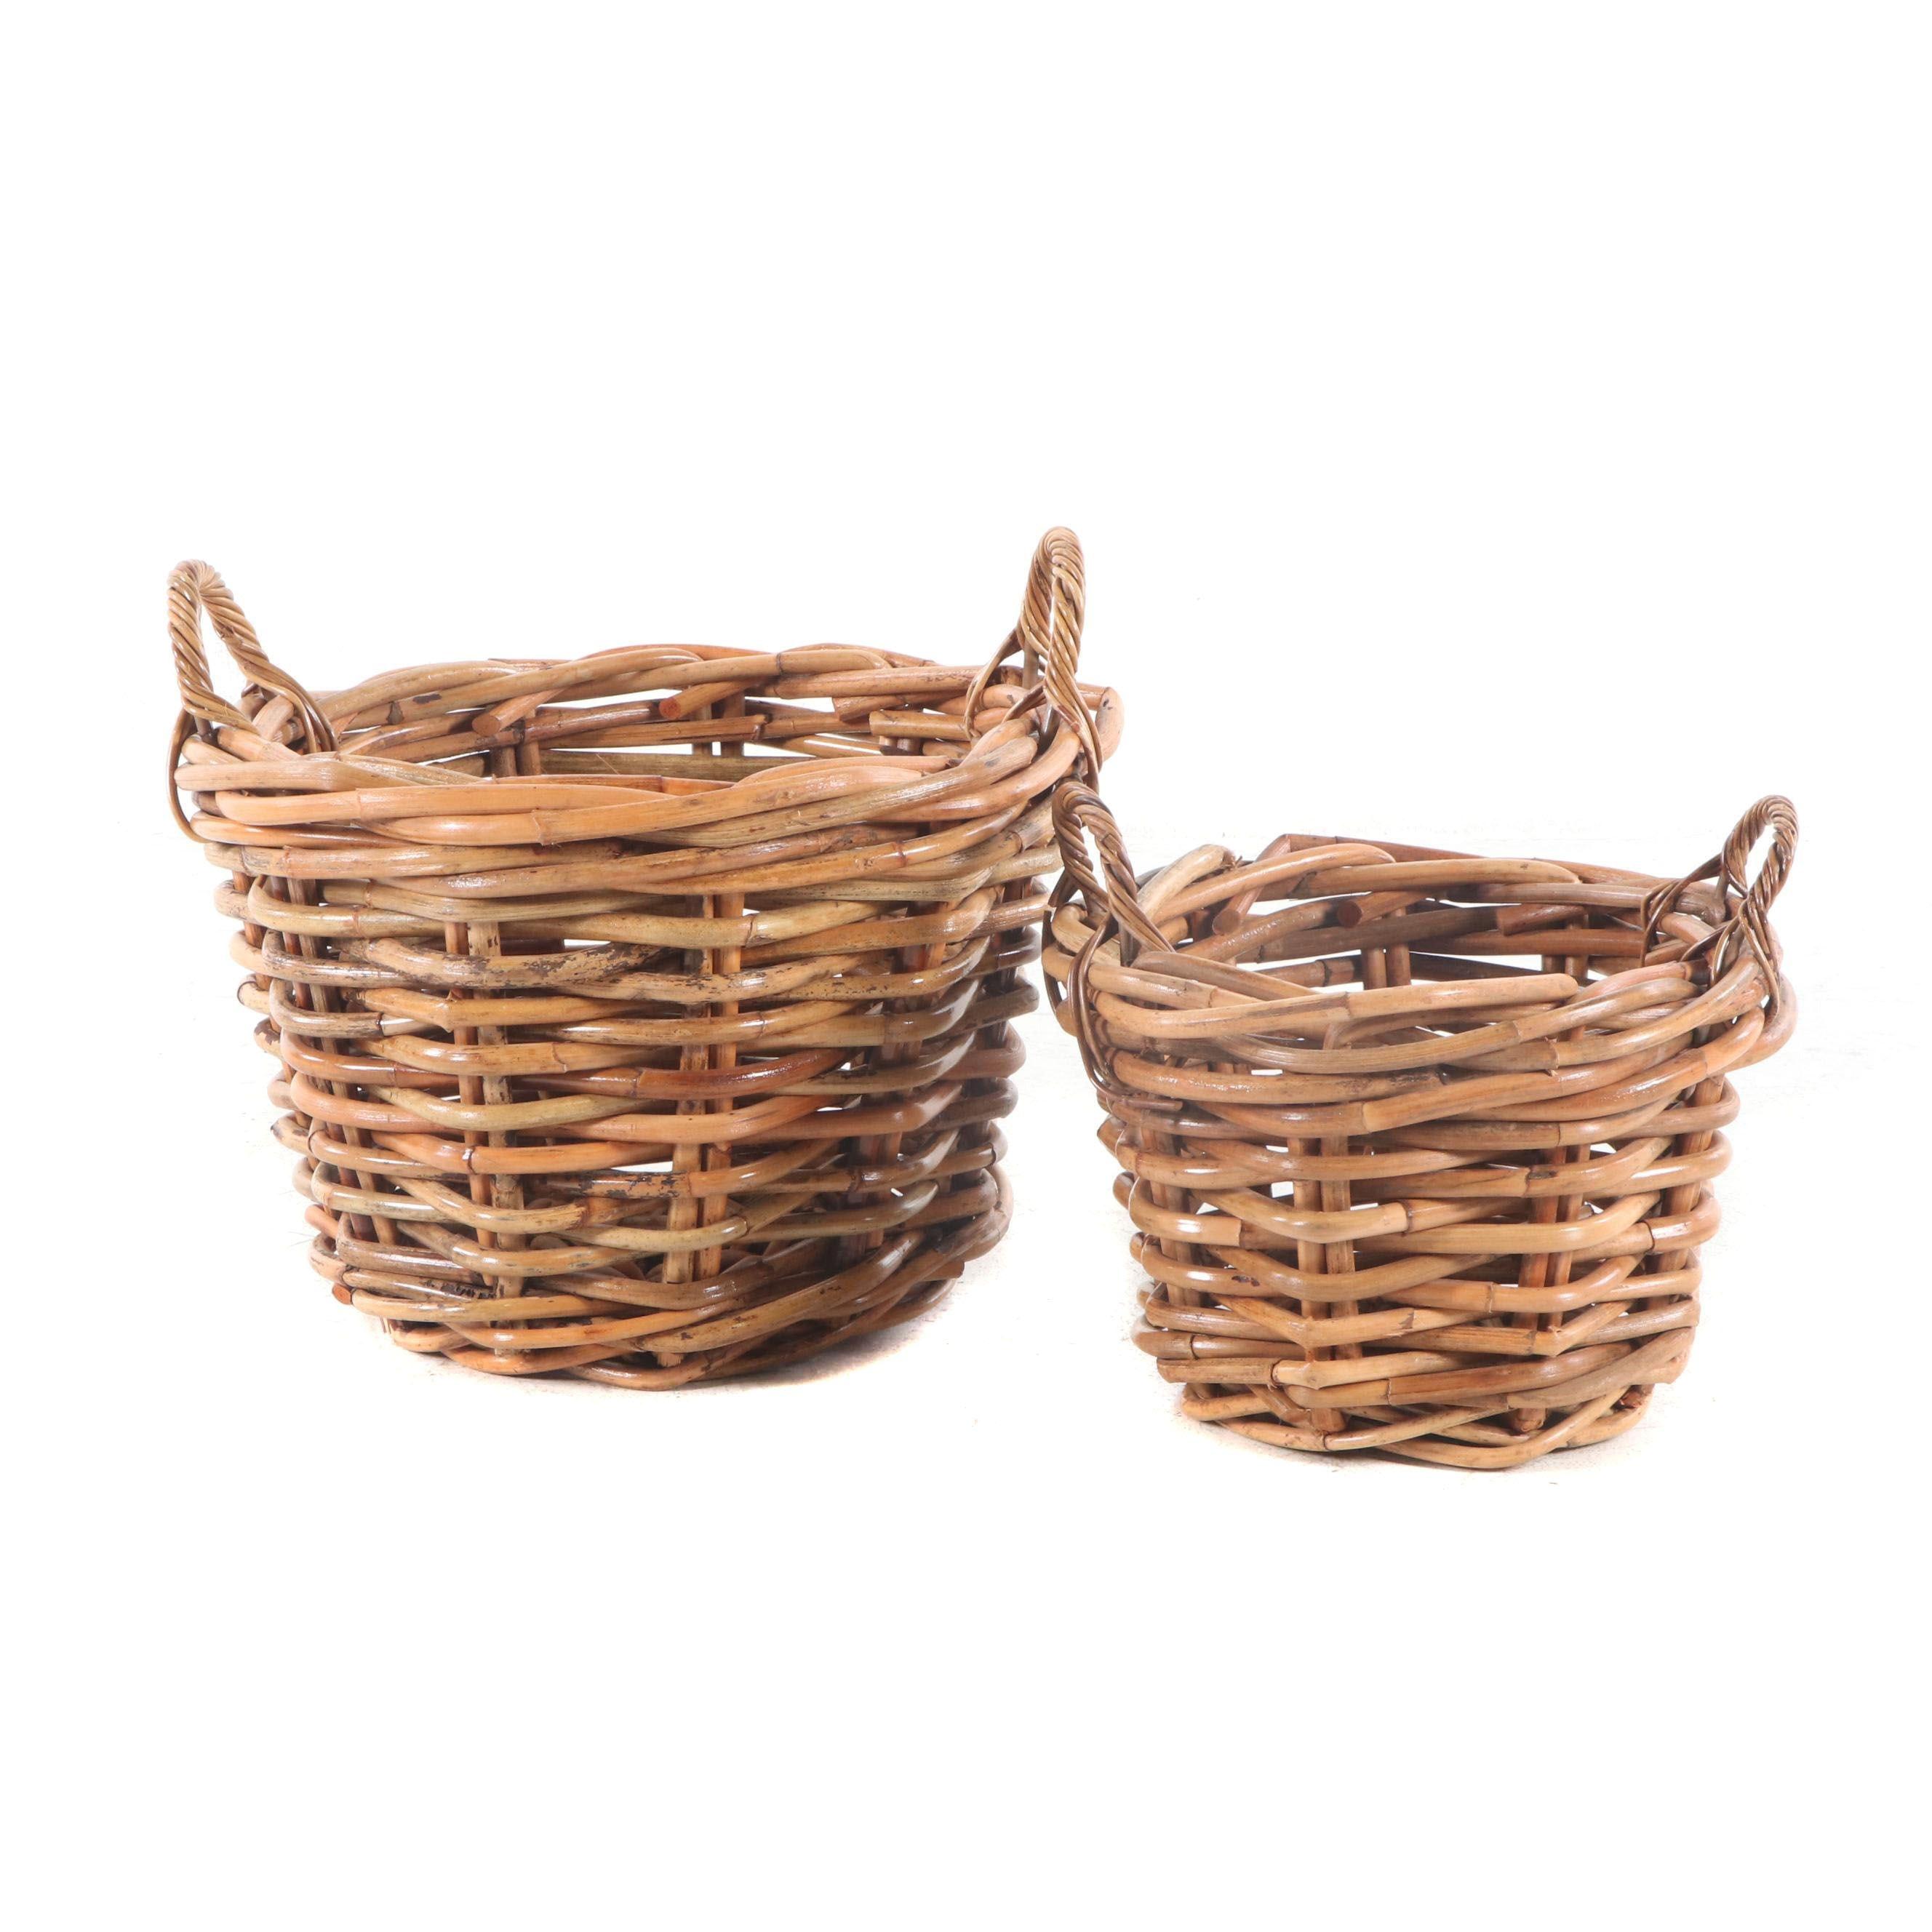 Oversize Woven Wooden Nesting Baskets